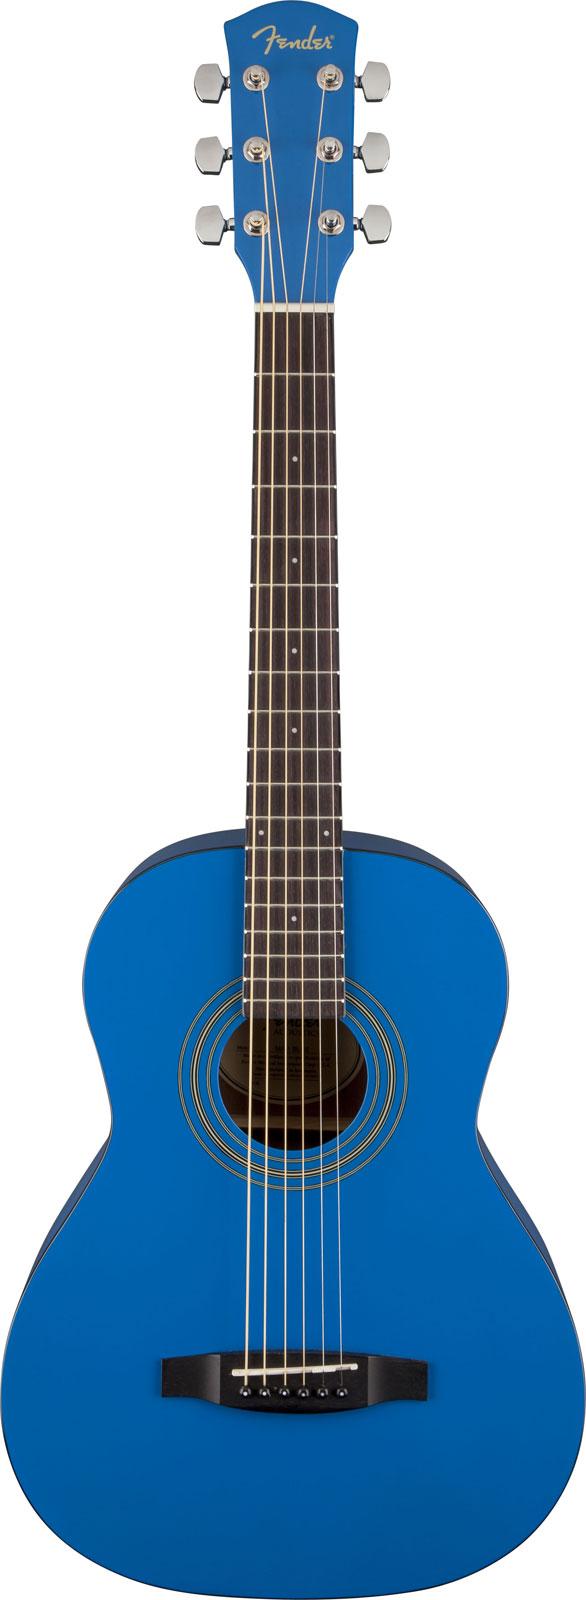 Fender Ma 1 3/4 Steel String Gloss Blue